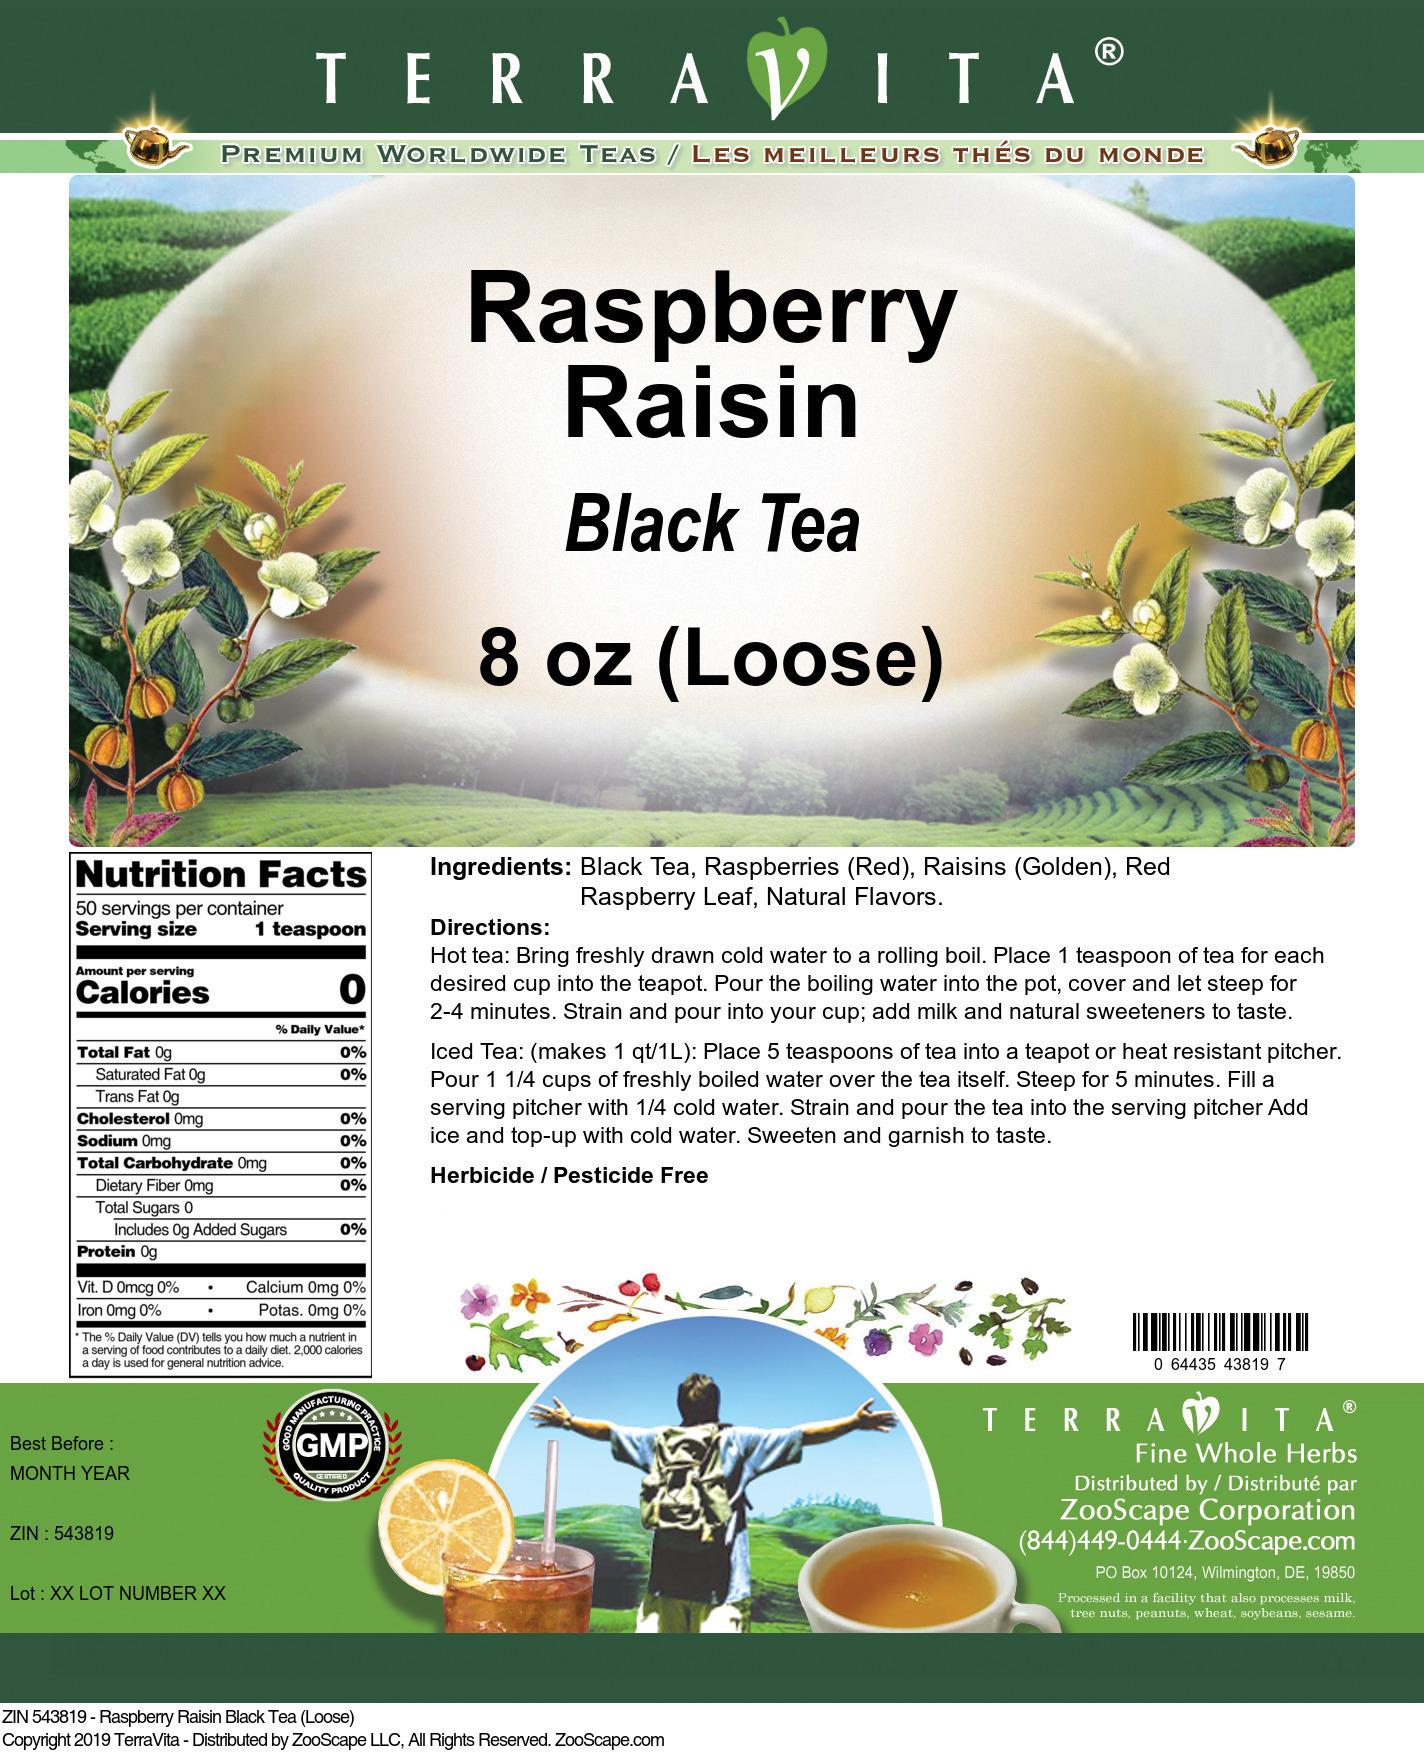 Raspberry Raisin Black Tea